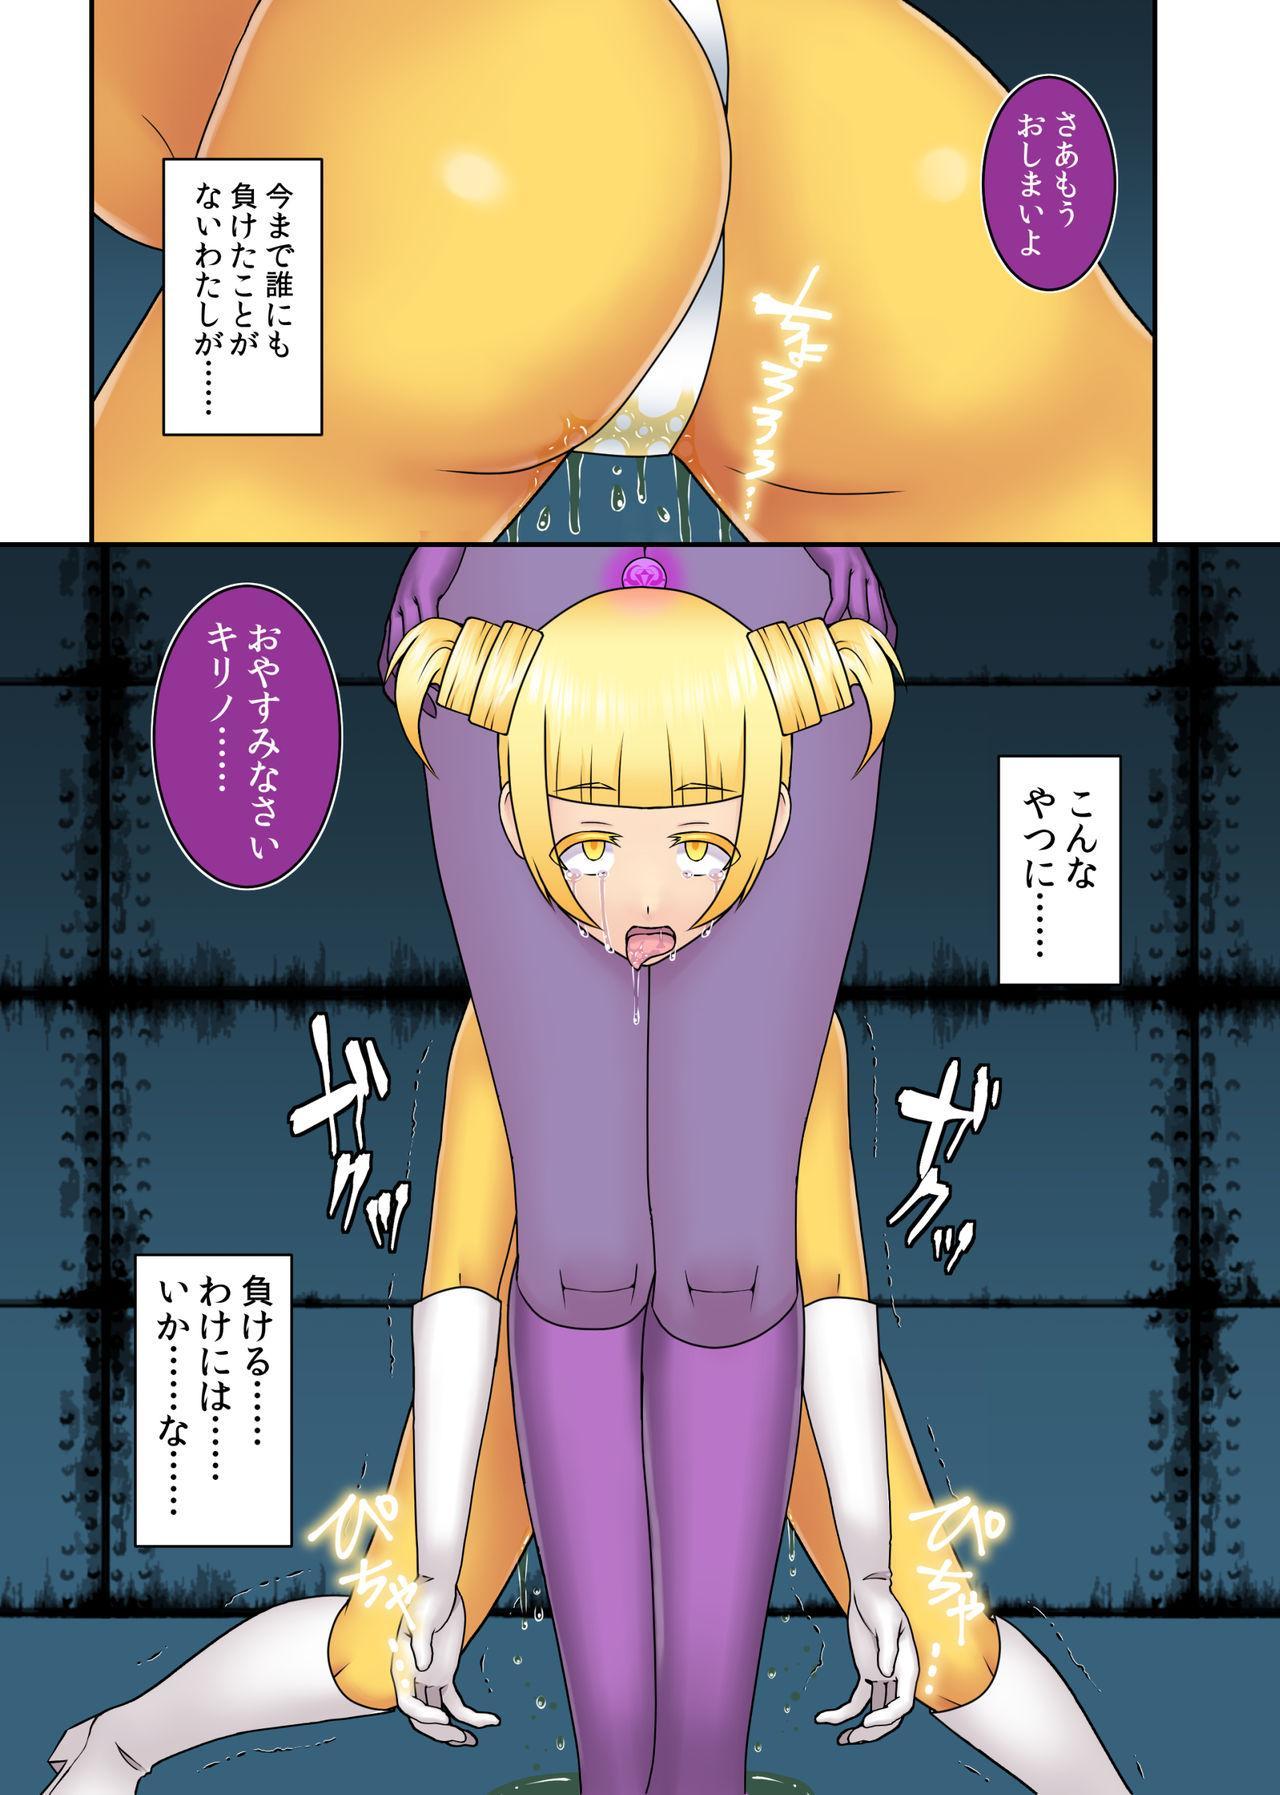 [STUDIO HP+ (IceLee)] Teisou Sentai Virginal Colors Dai-Go-wa 15